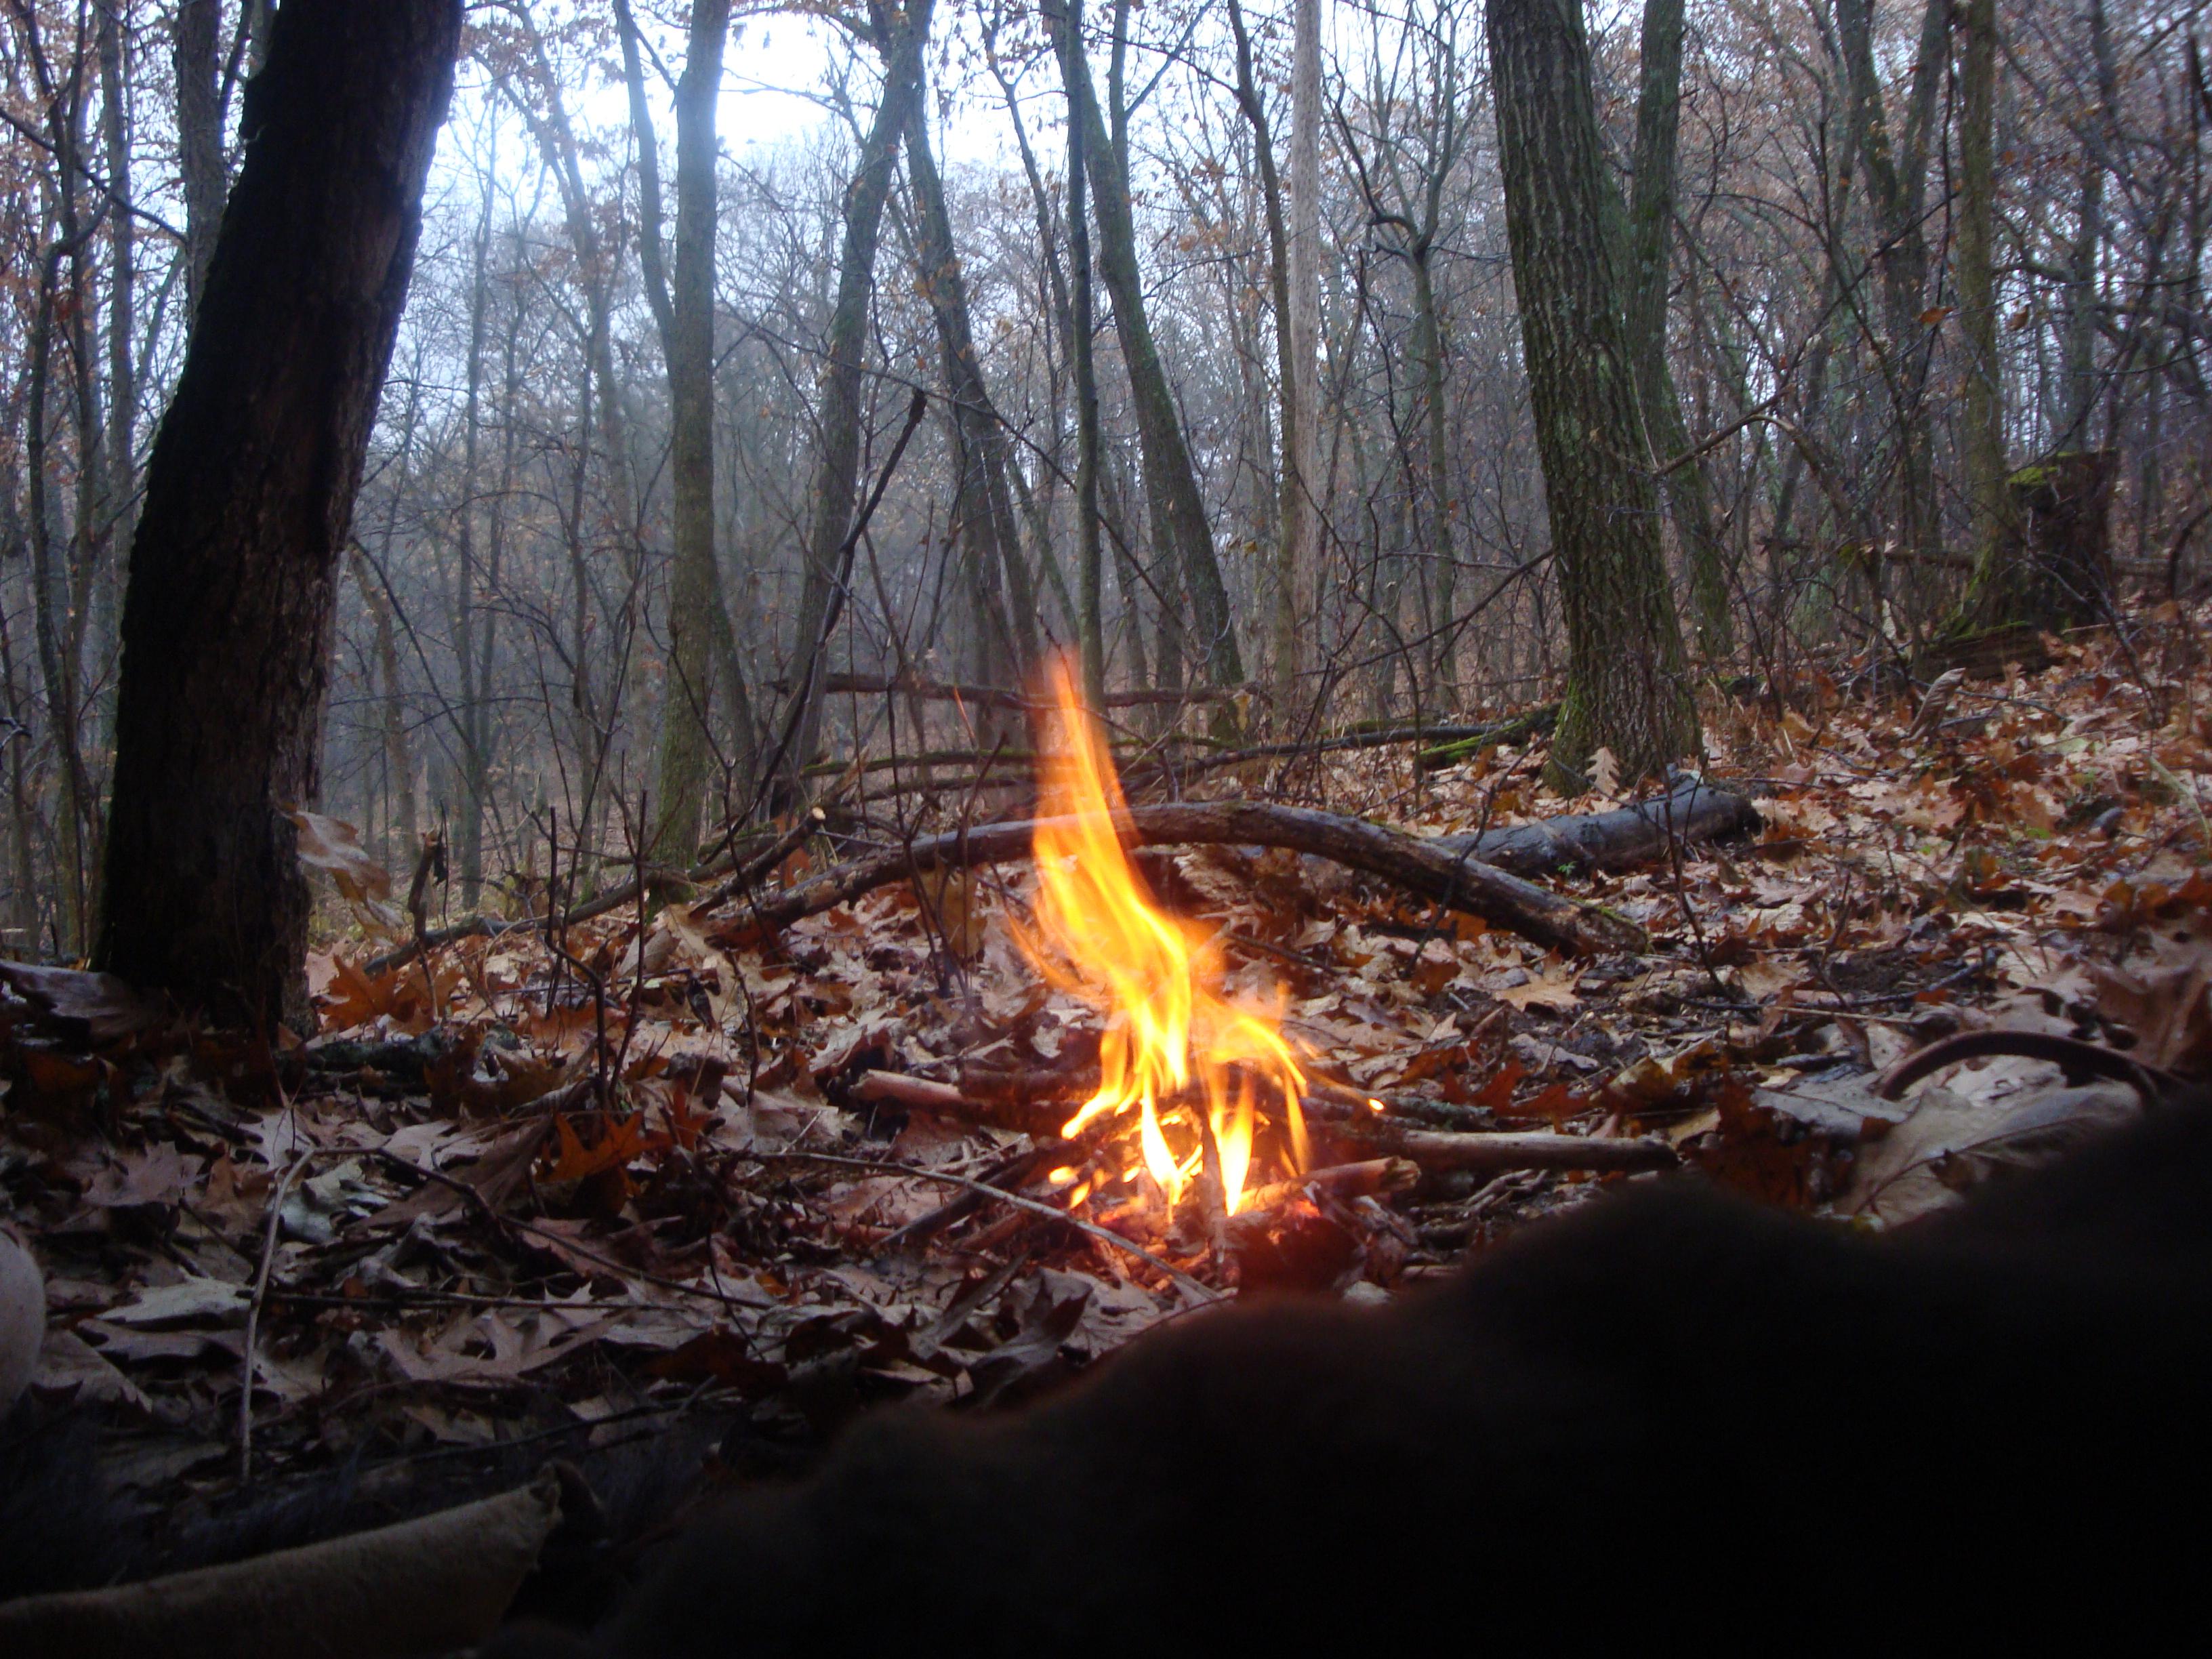 The Wet Woods